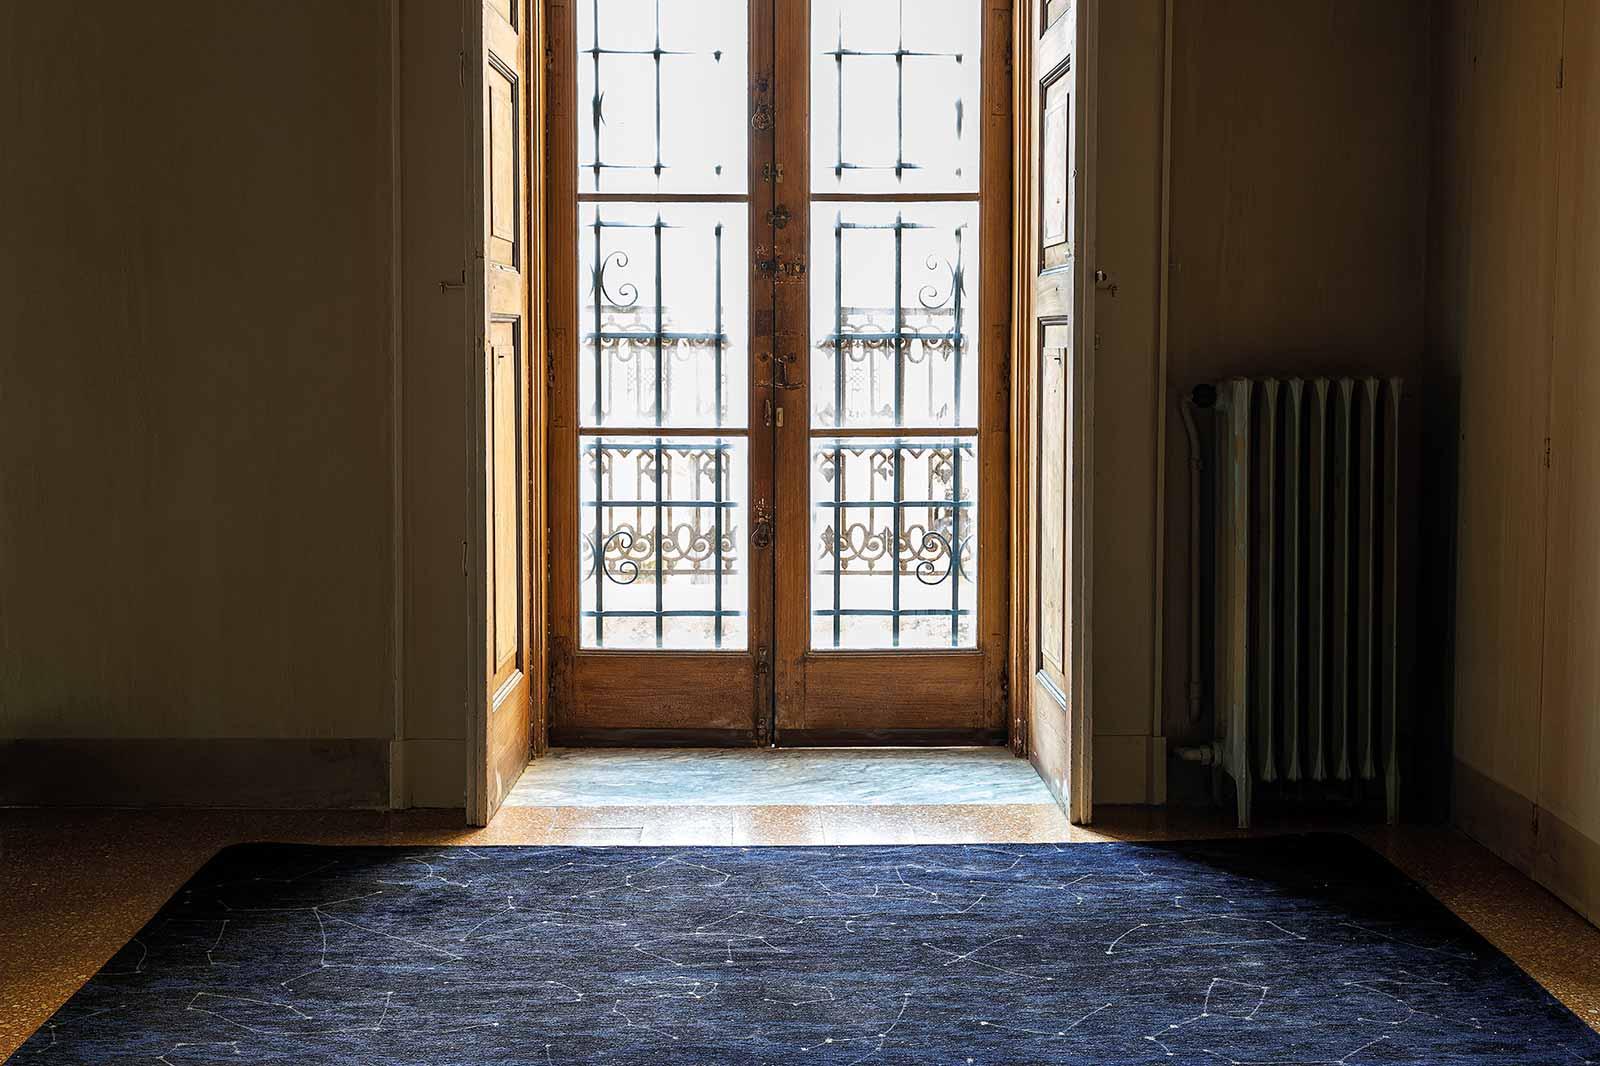 Louis De Poortere tapis Fischbacher Celestial 9060 interior 2